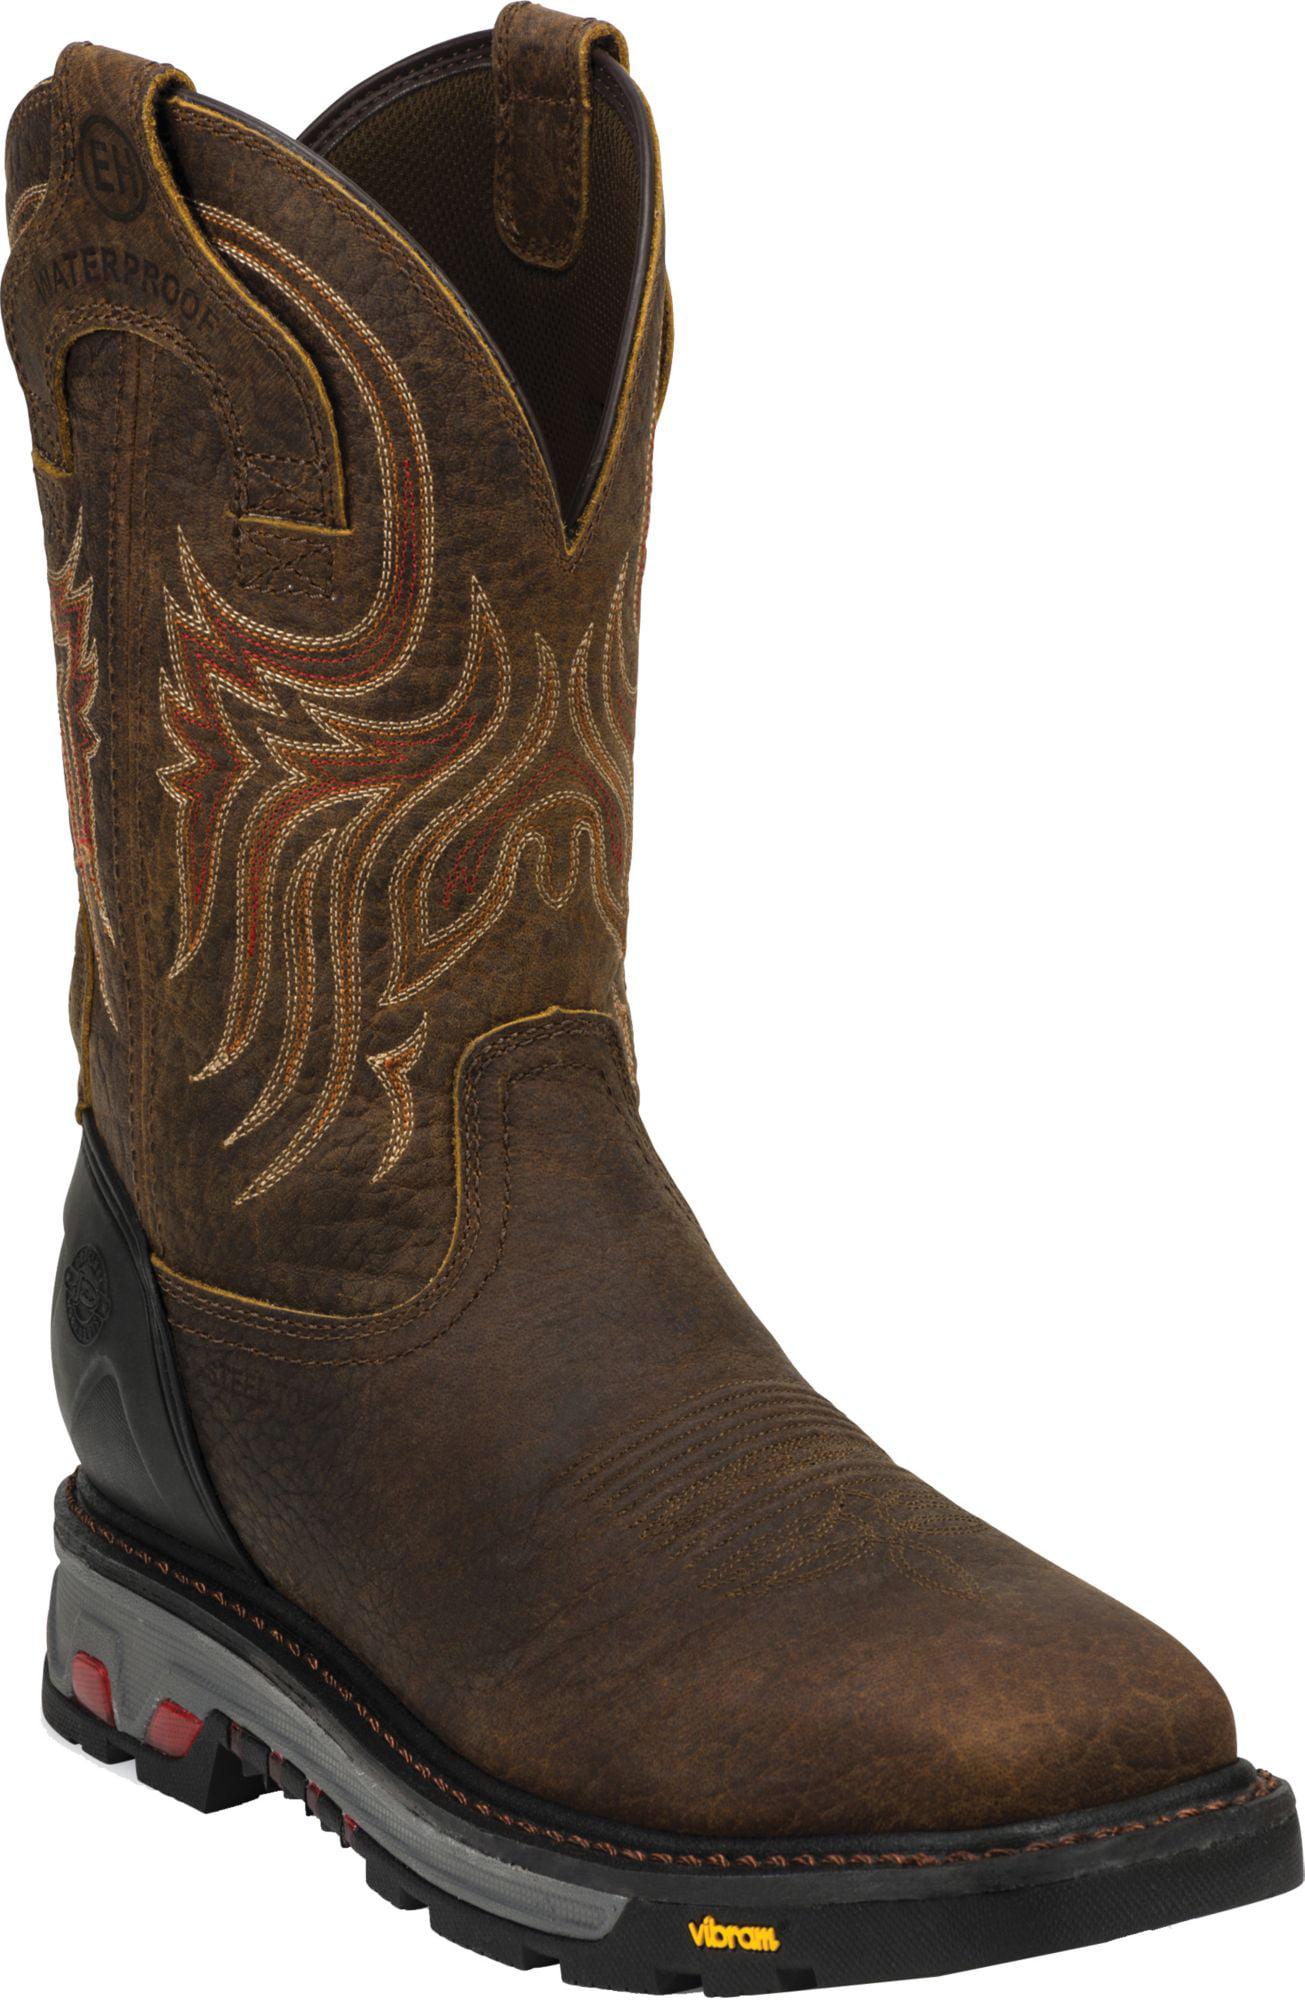 Steel Toe Work Boots - Walmart